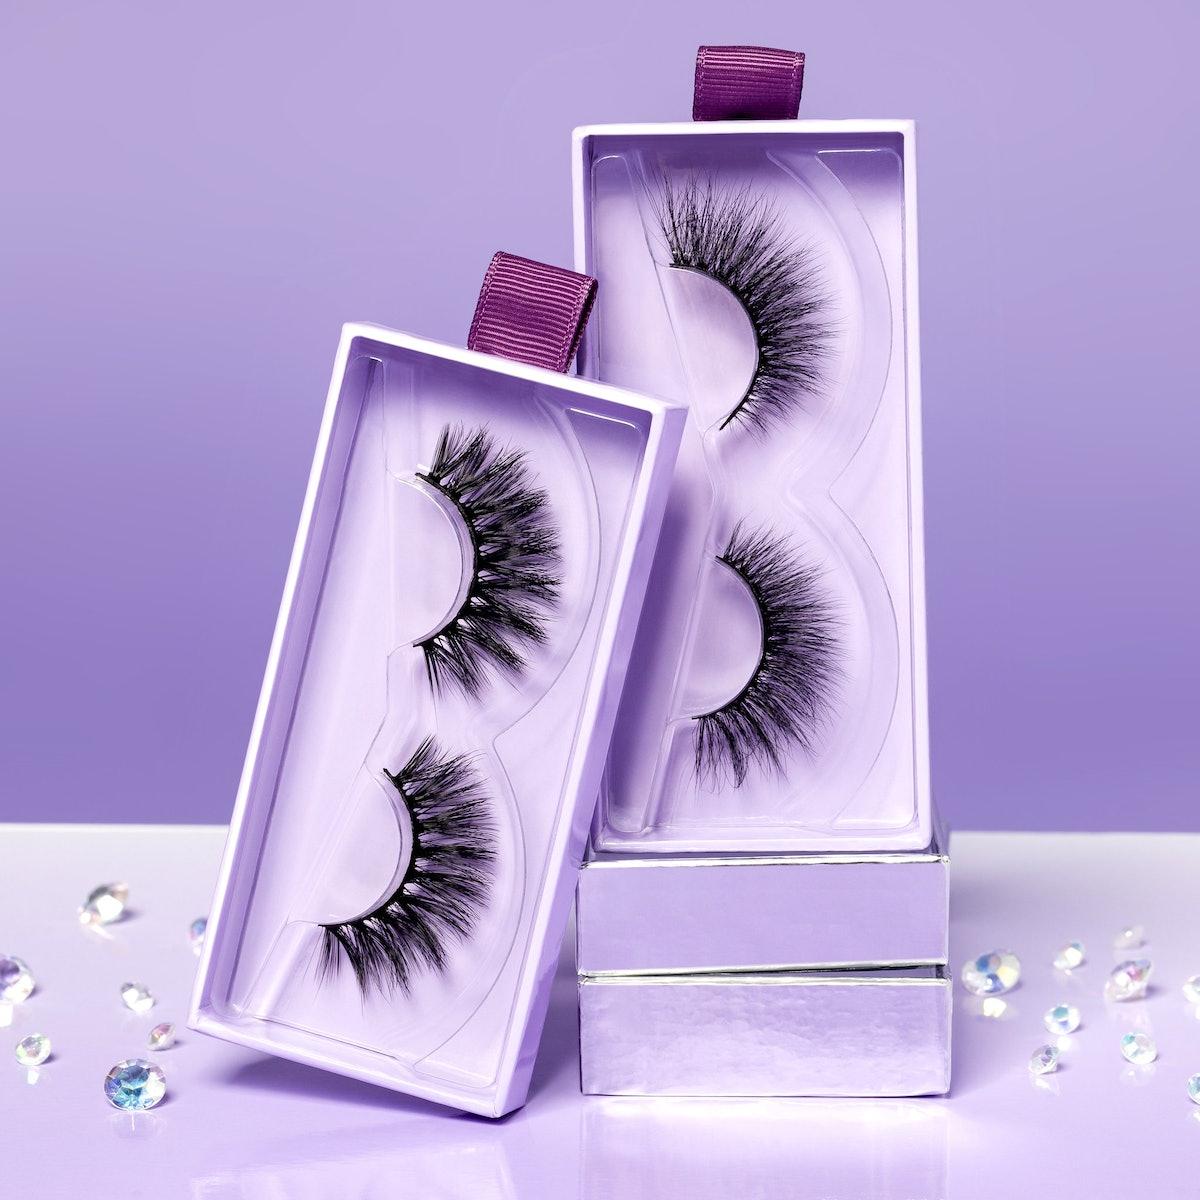 Mikayla x Glamlite 3D Faux Lashes Brand New